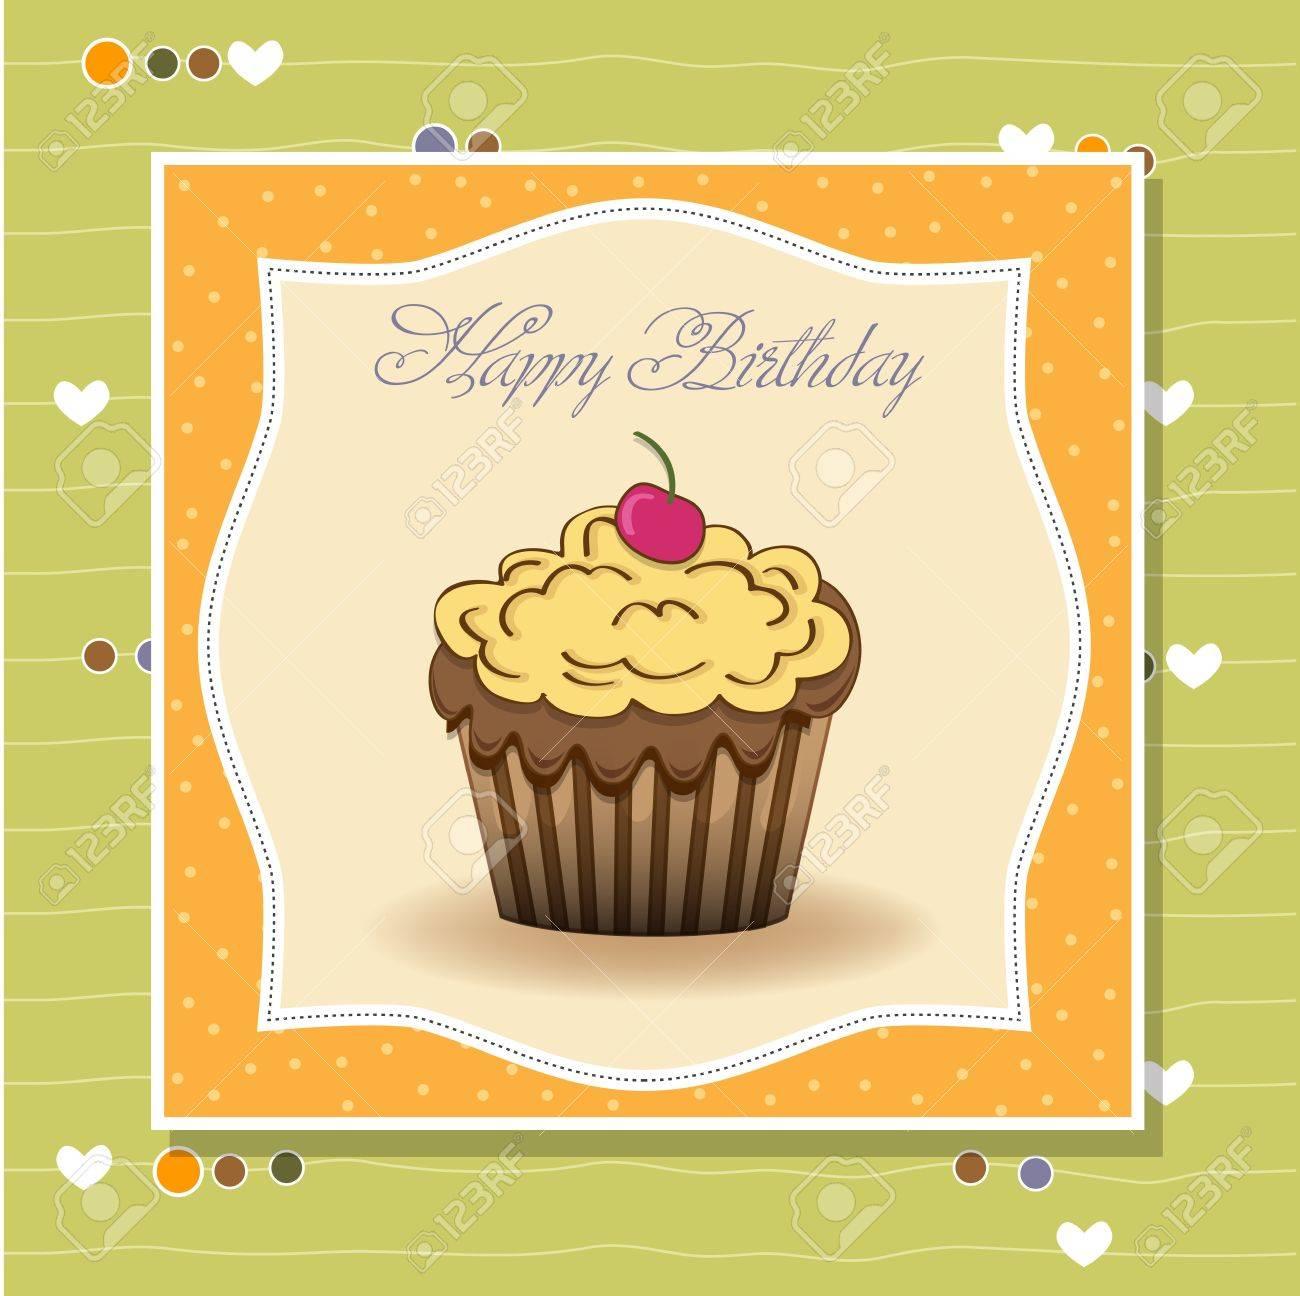 Cute Happy Birthday Card With Cupcake Vector Illustration Royalty – Cupcake Birthday Card